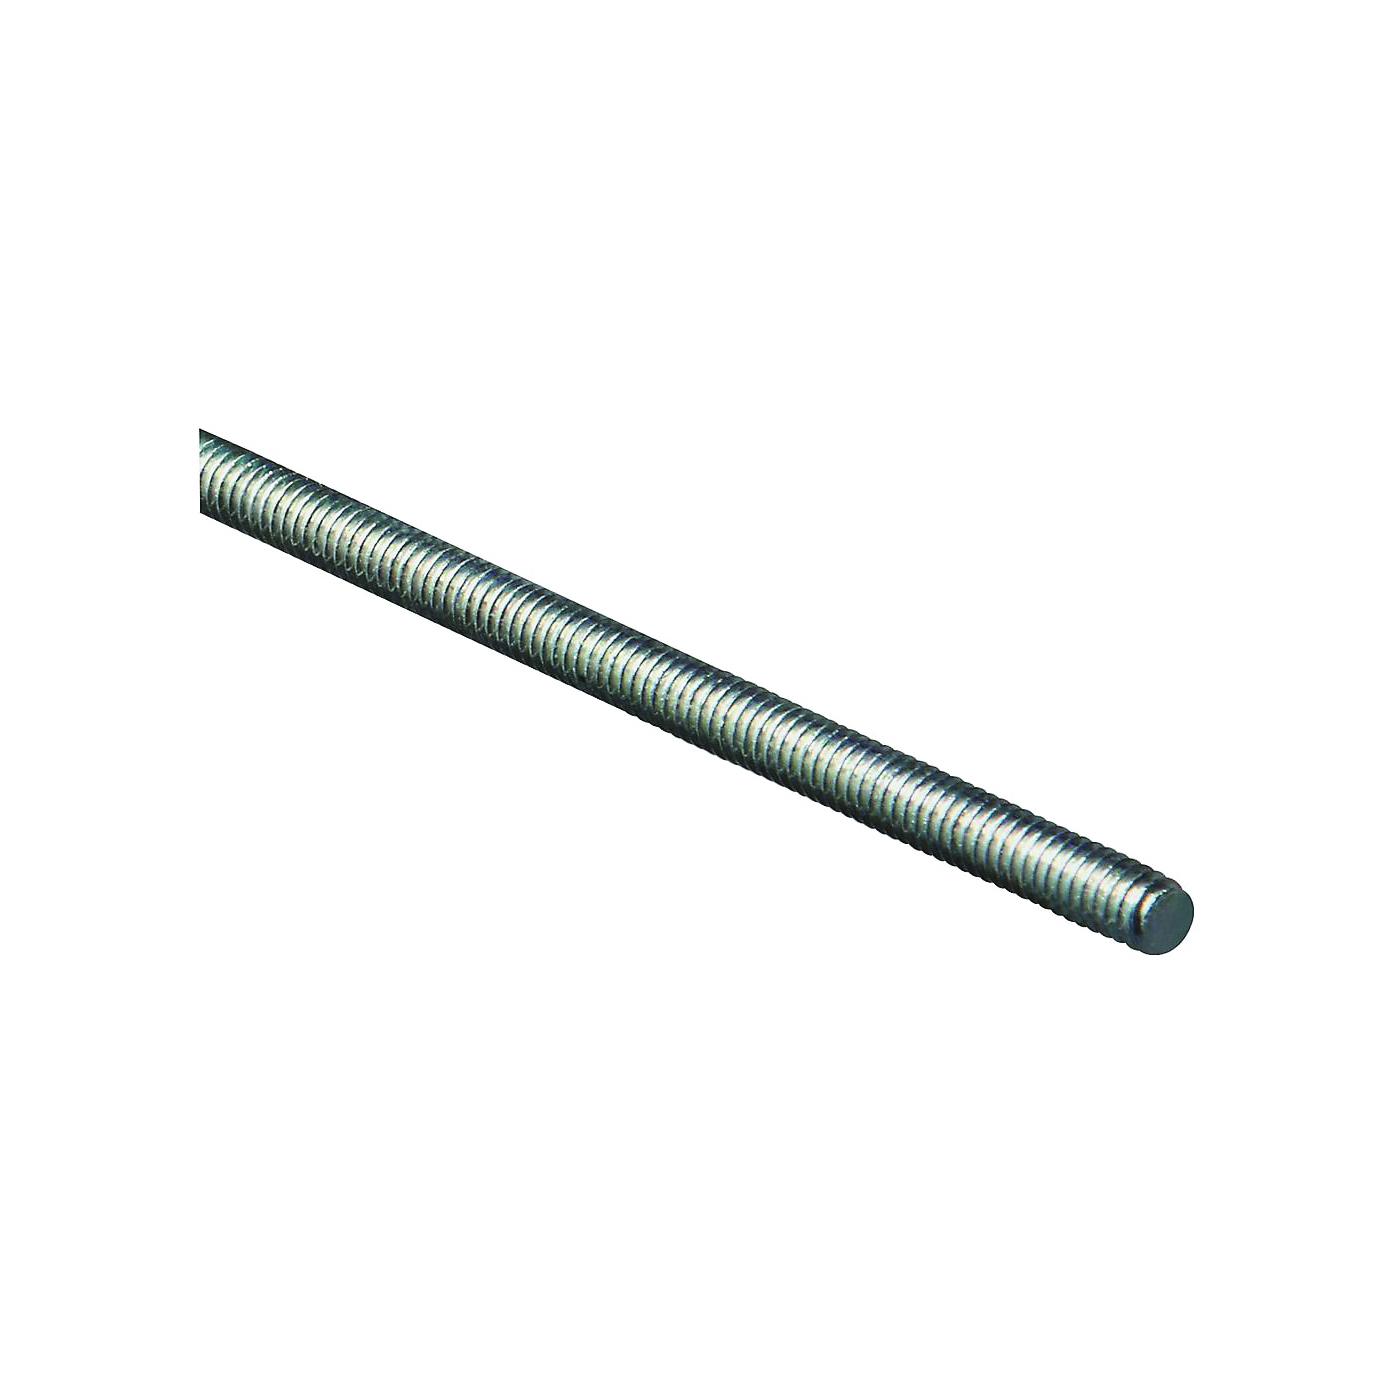 Picture of Stanley Hardware 179499 Threaded Rod, 1/4-20 Thread, 36 in L, A Grade, Steel, Zinc, UNC Thread